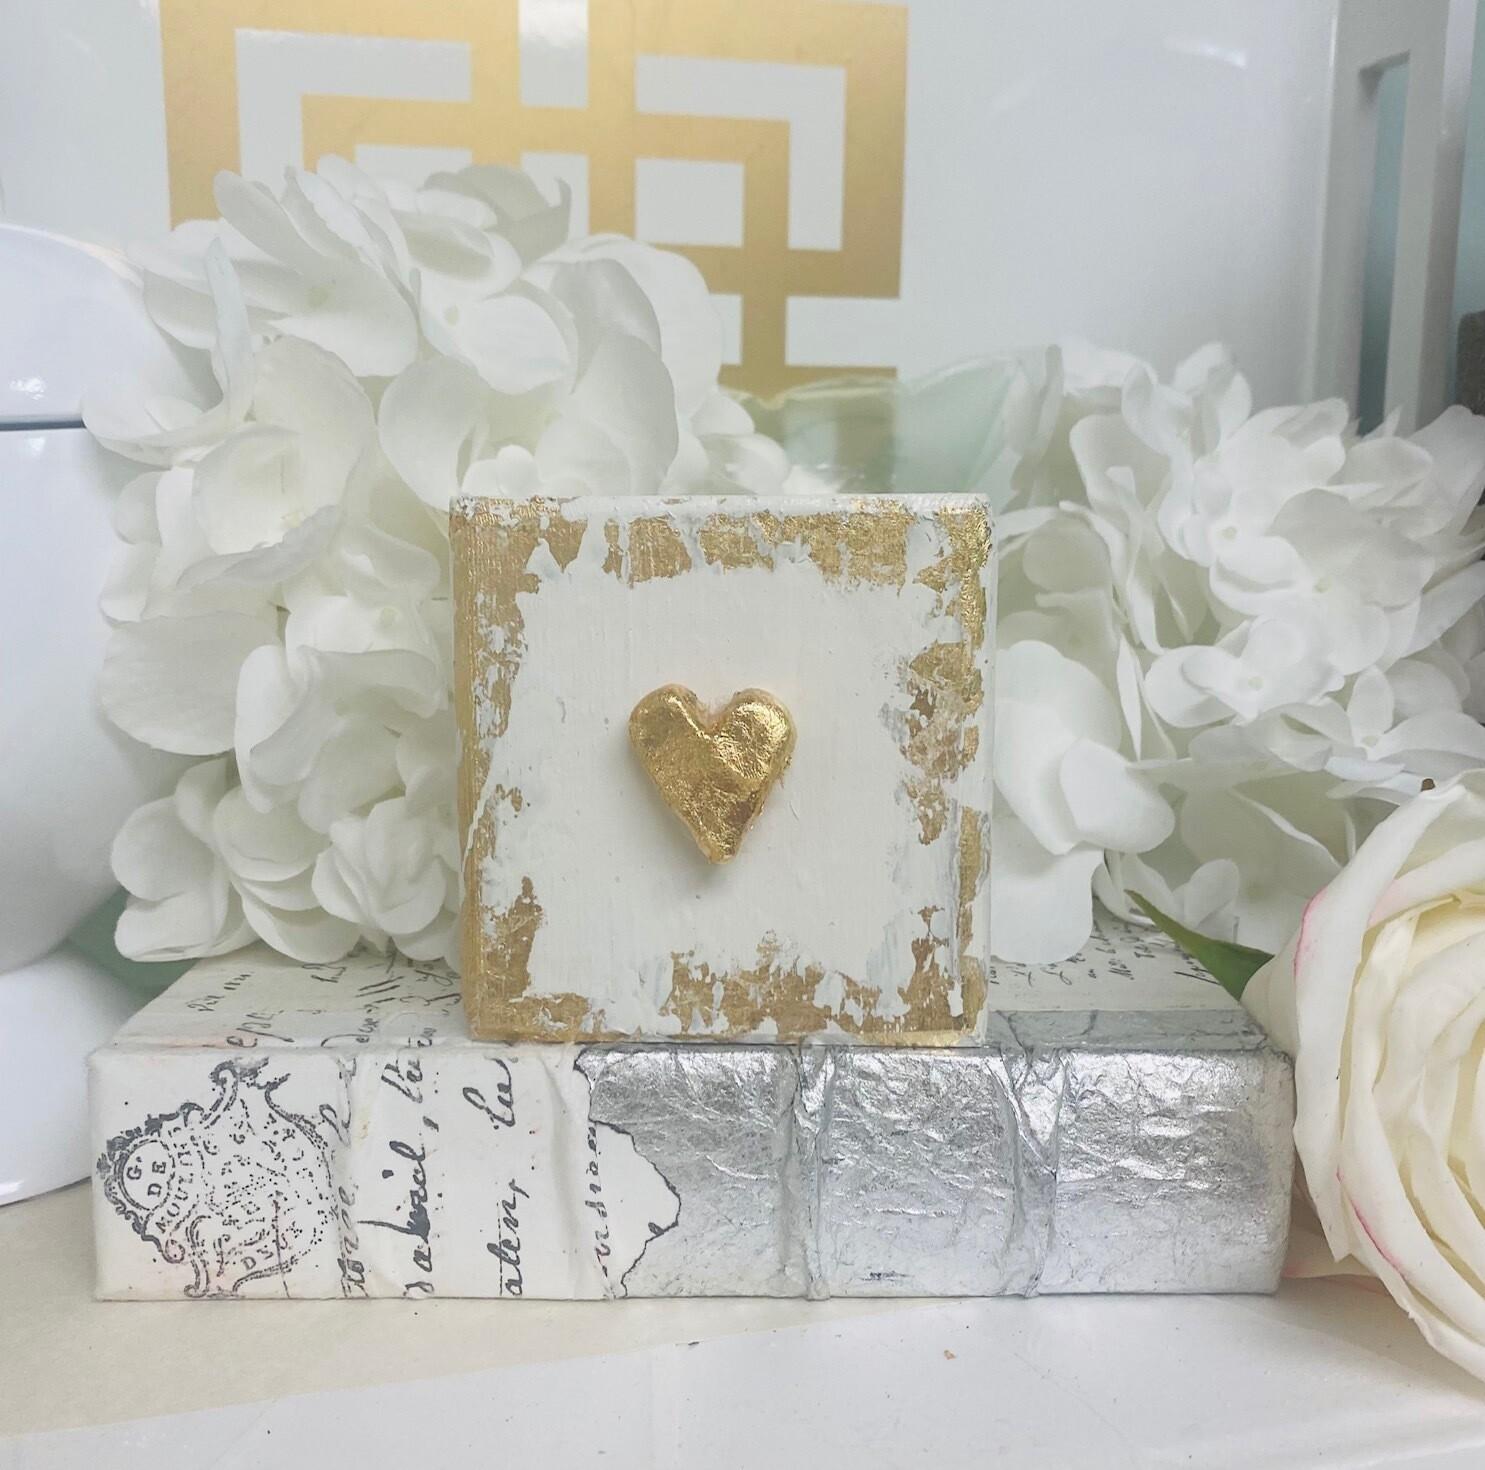 4x4 Wood Block Small Heart White